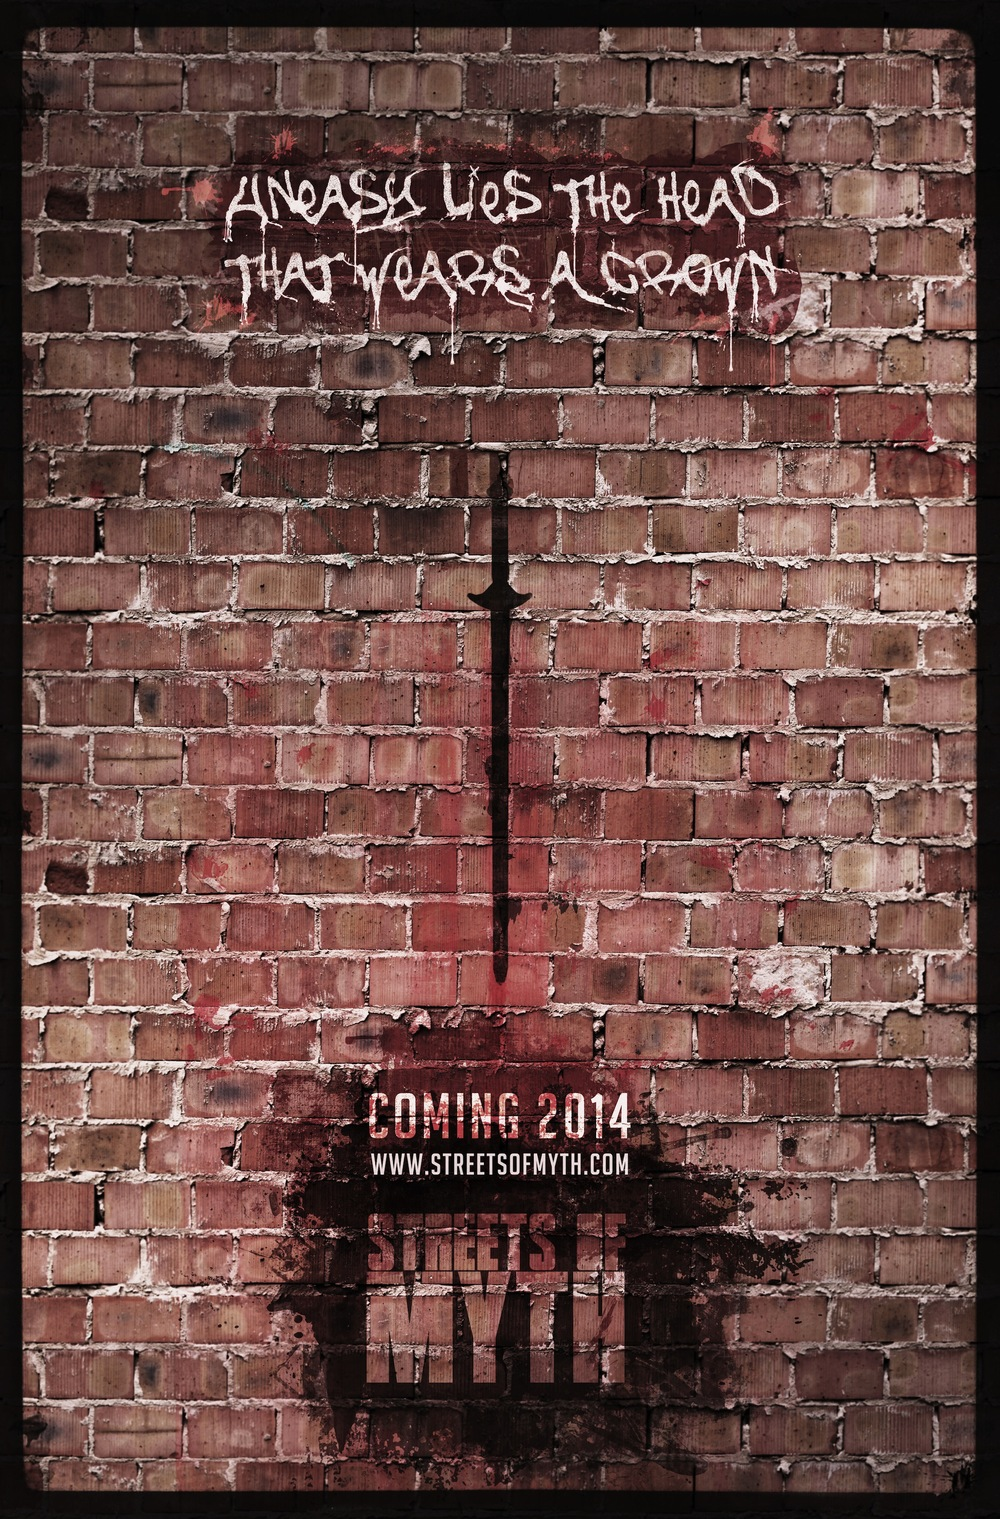 Streets of Myth Teaser Poster